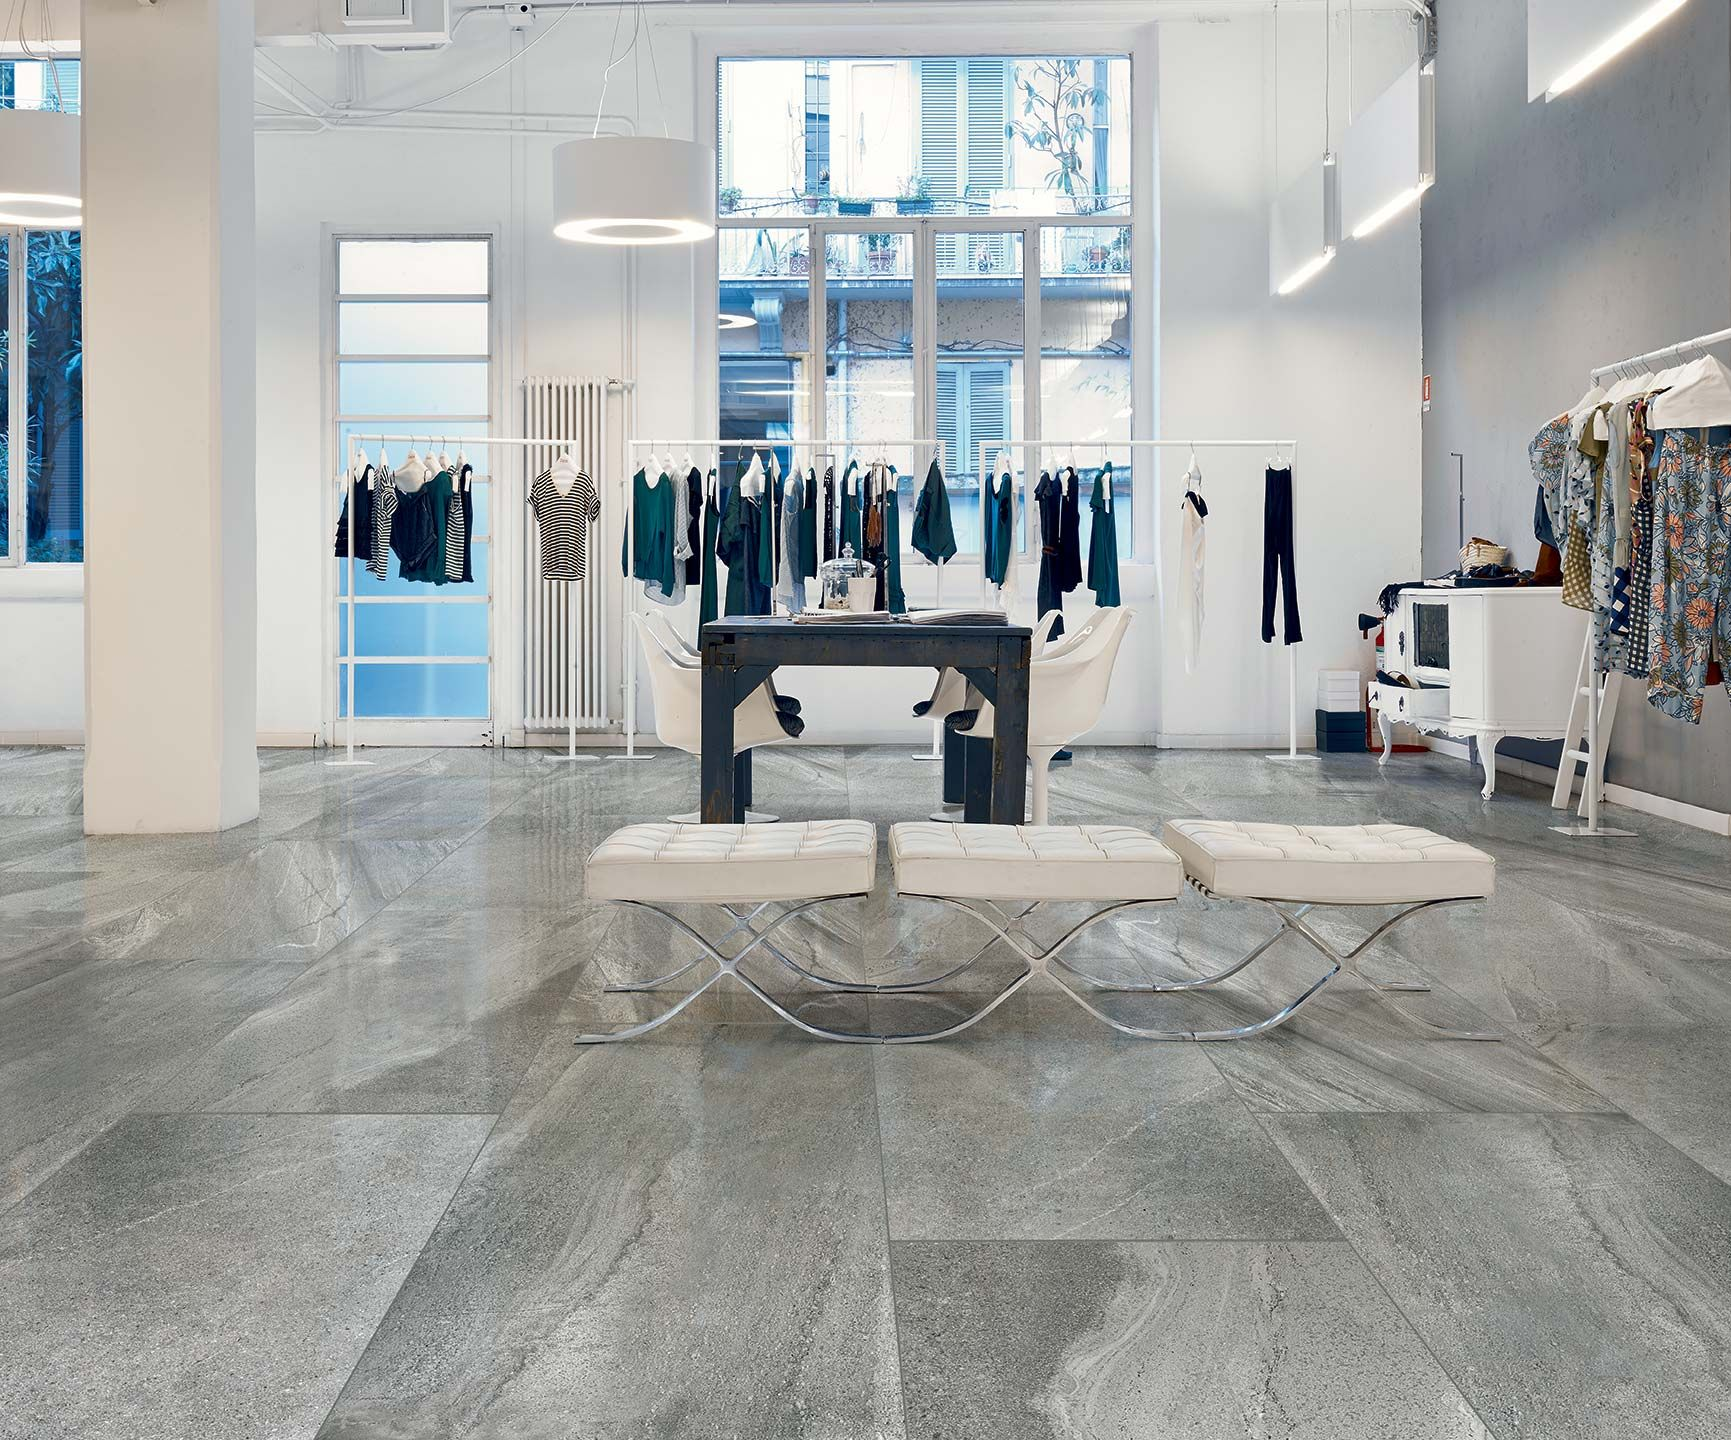 Luxury porcelain tile surface tiles luxury porcelain tiles in metal - Fiorano Italian Stones Quartz Grey Porcelain Tile Http Www Ceramictechnics Laying Tilegrey Tilesstone